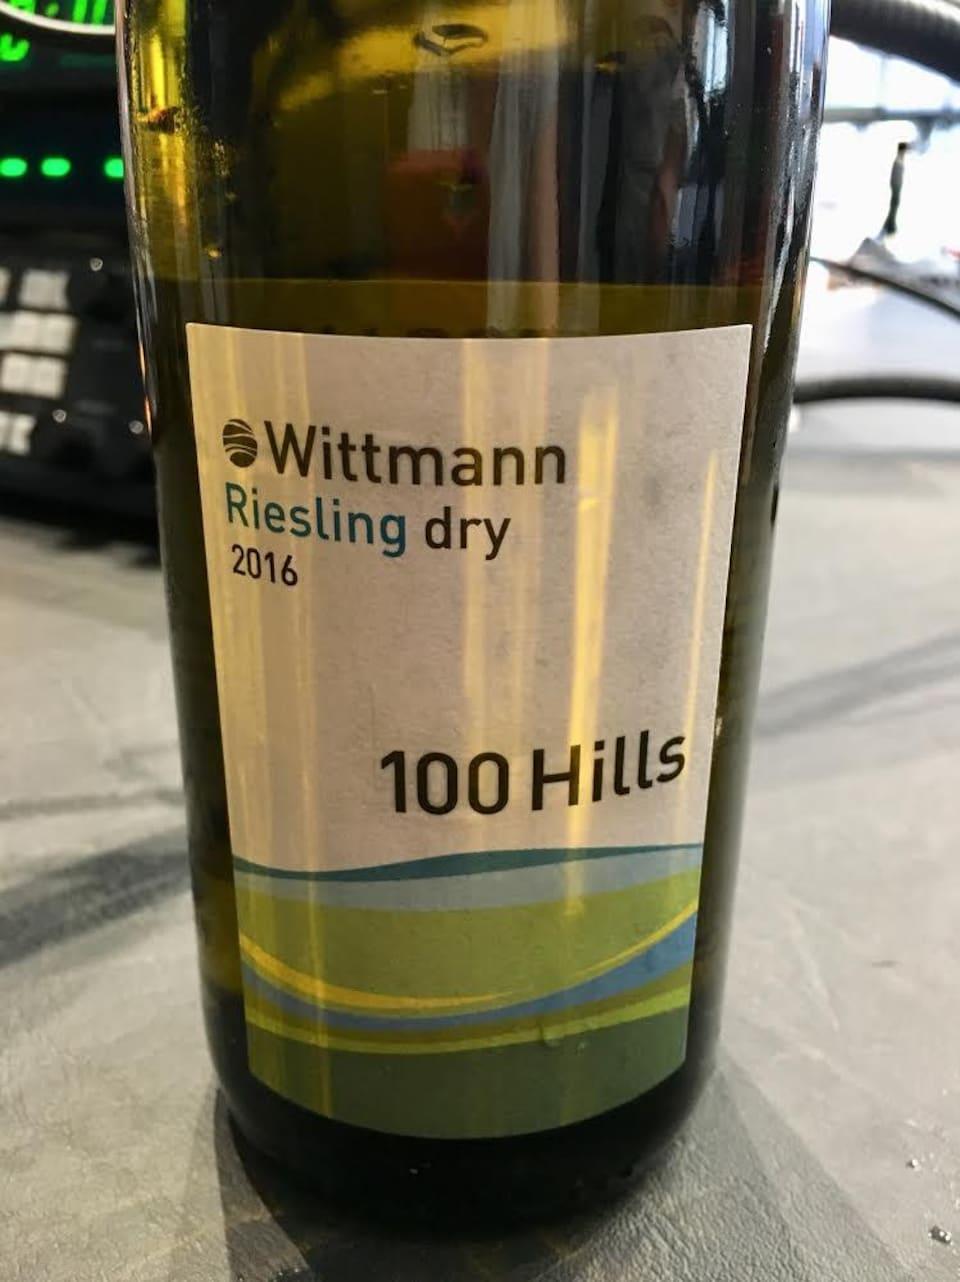 Weingut Wittmann Riesling 100 Hills 2016, Code SAQ : 13109700 , 20,75$